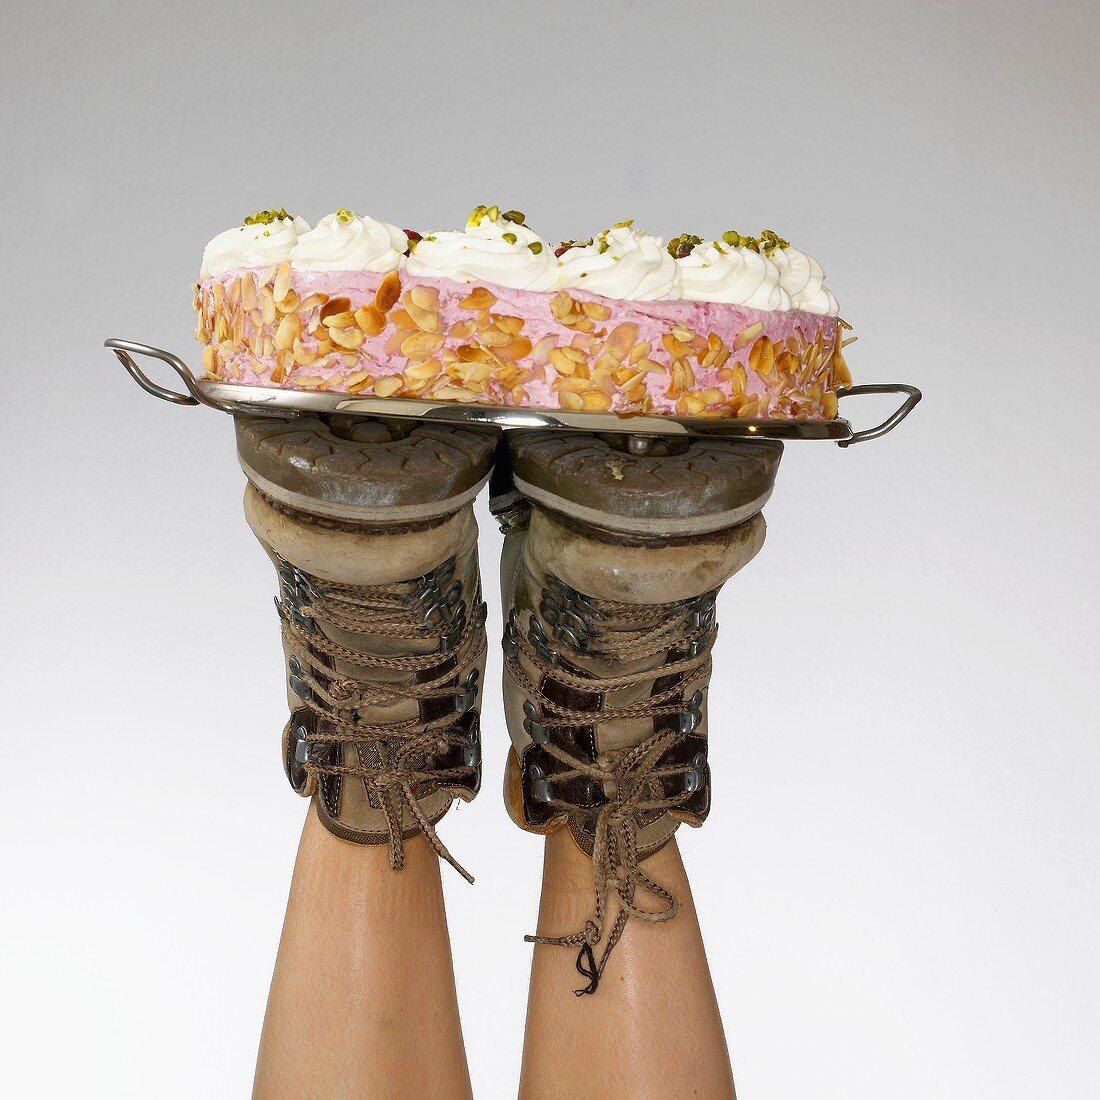 Two feet balancing a cream cake on a tray